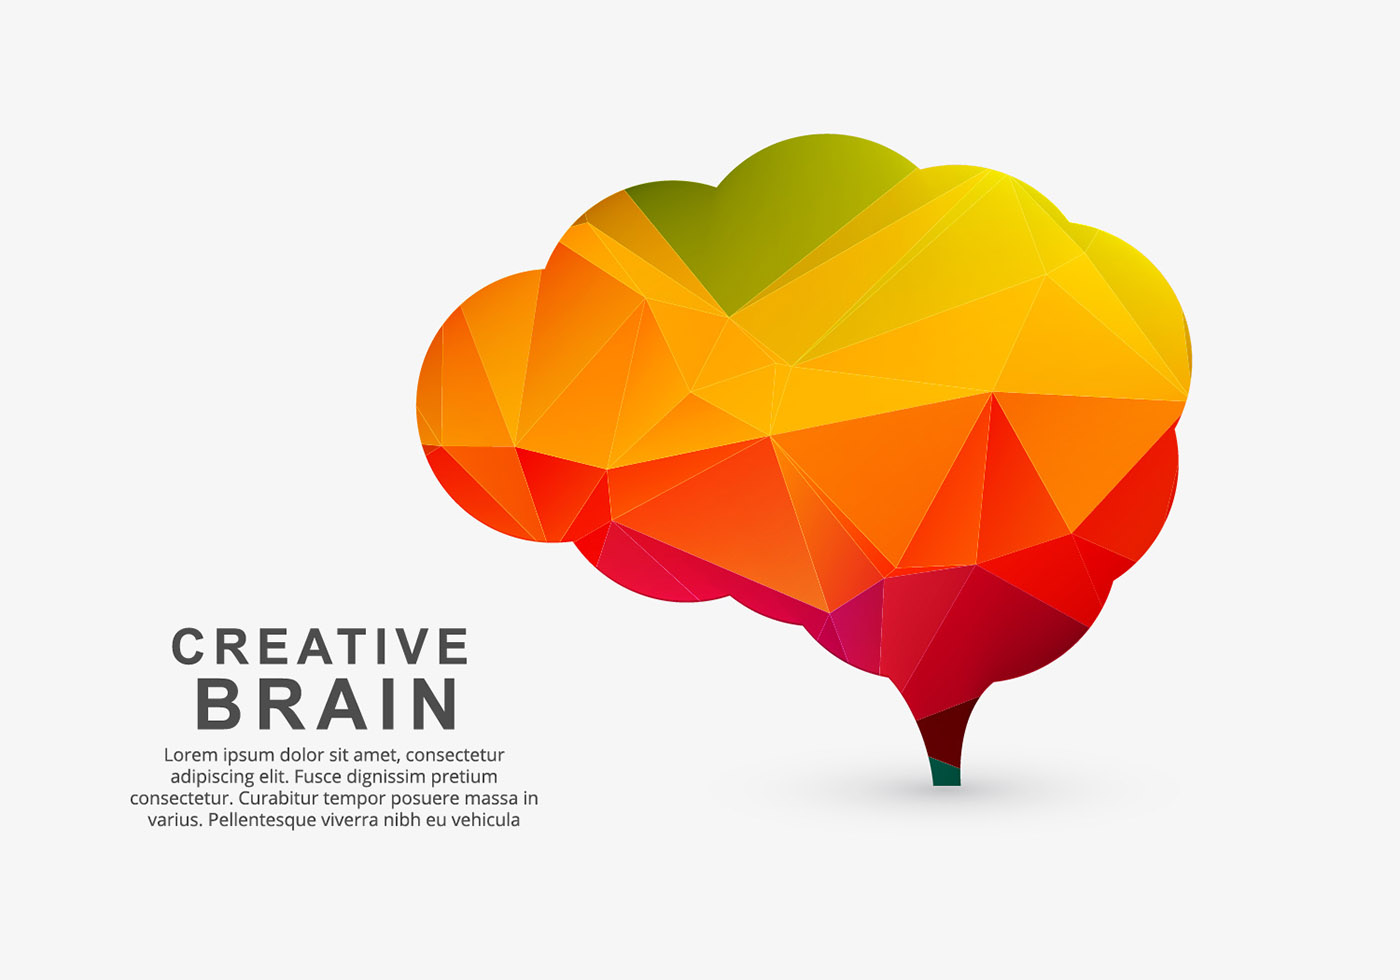 Colorful creative brain - Download Free Vector Art, Stock ...